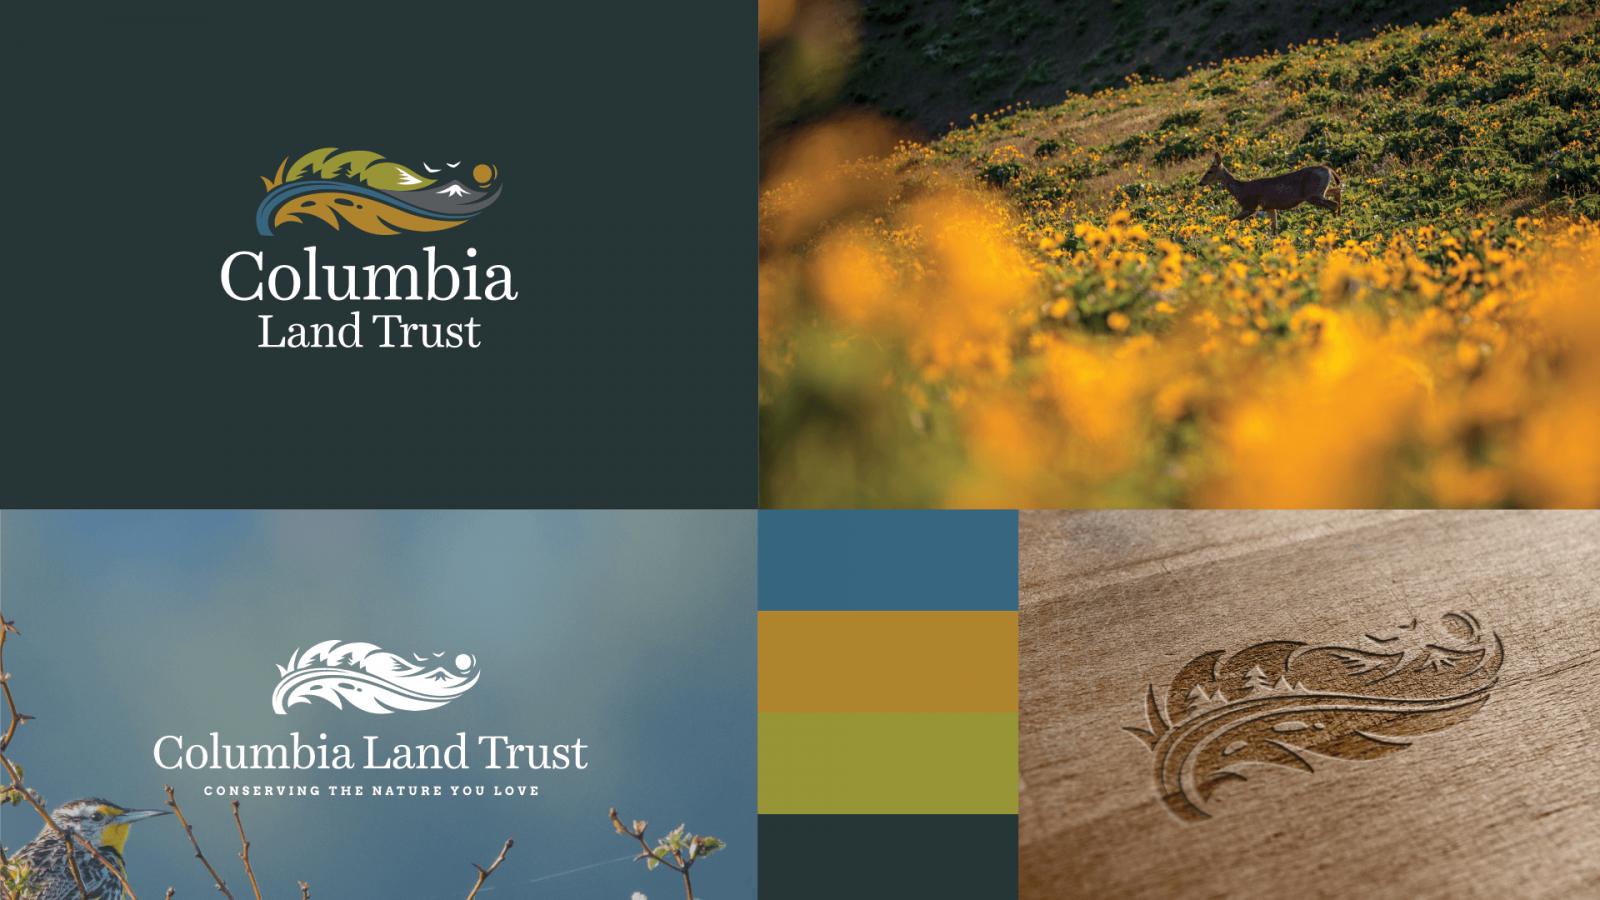 Columbia Land Trust Brand